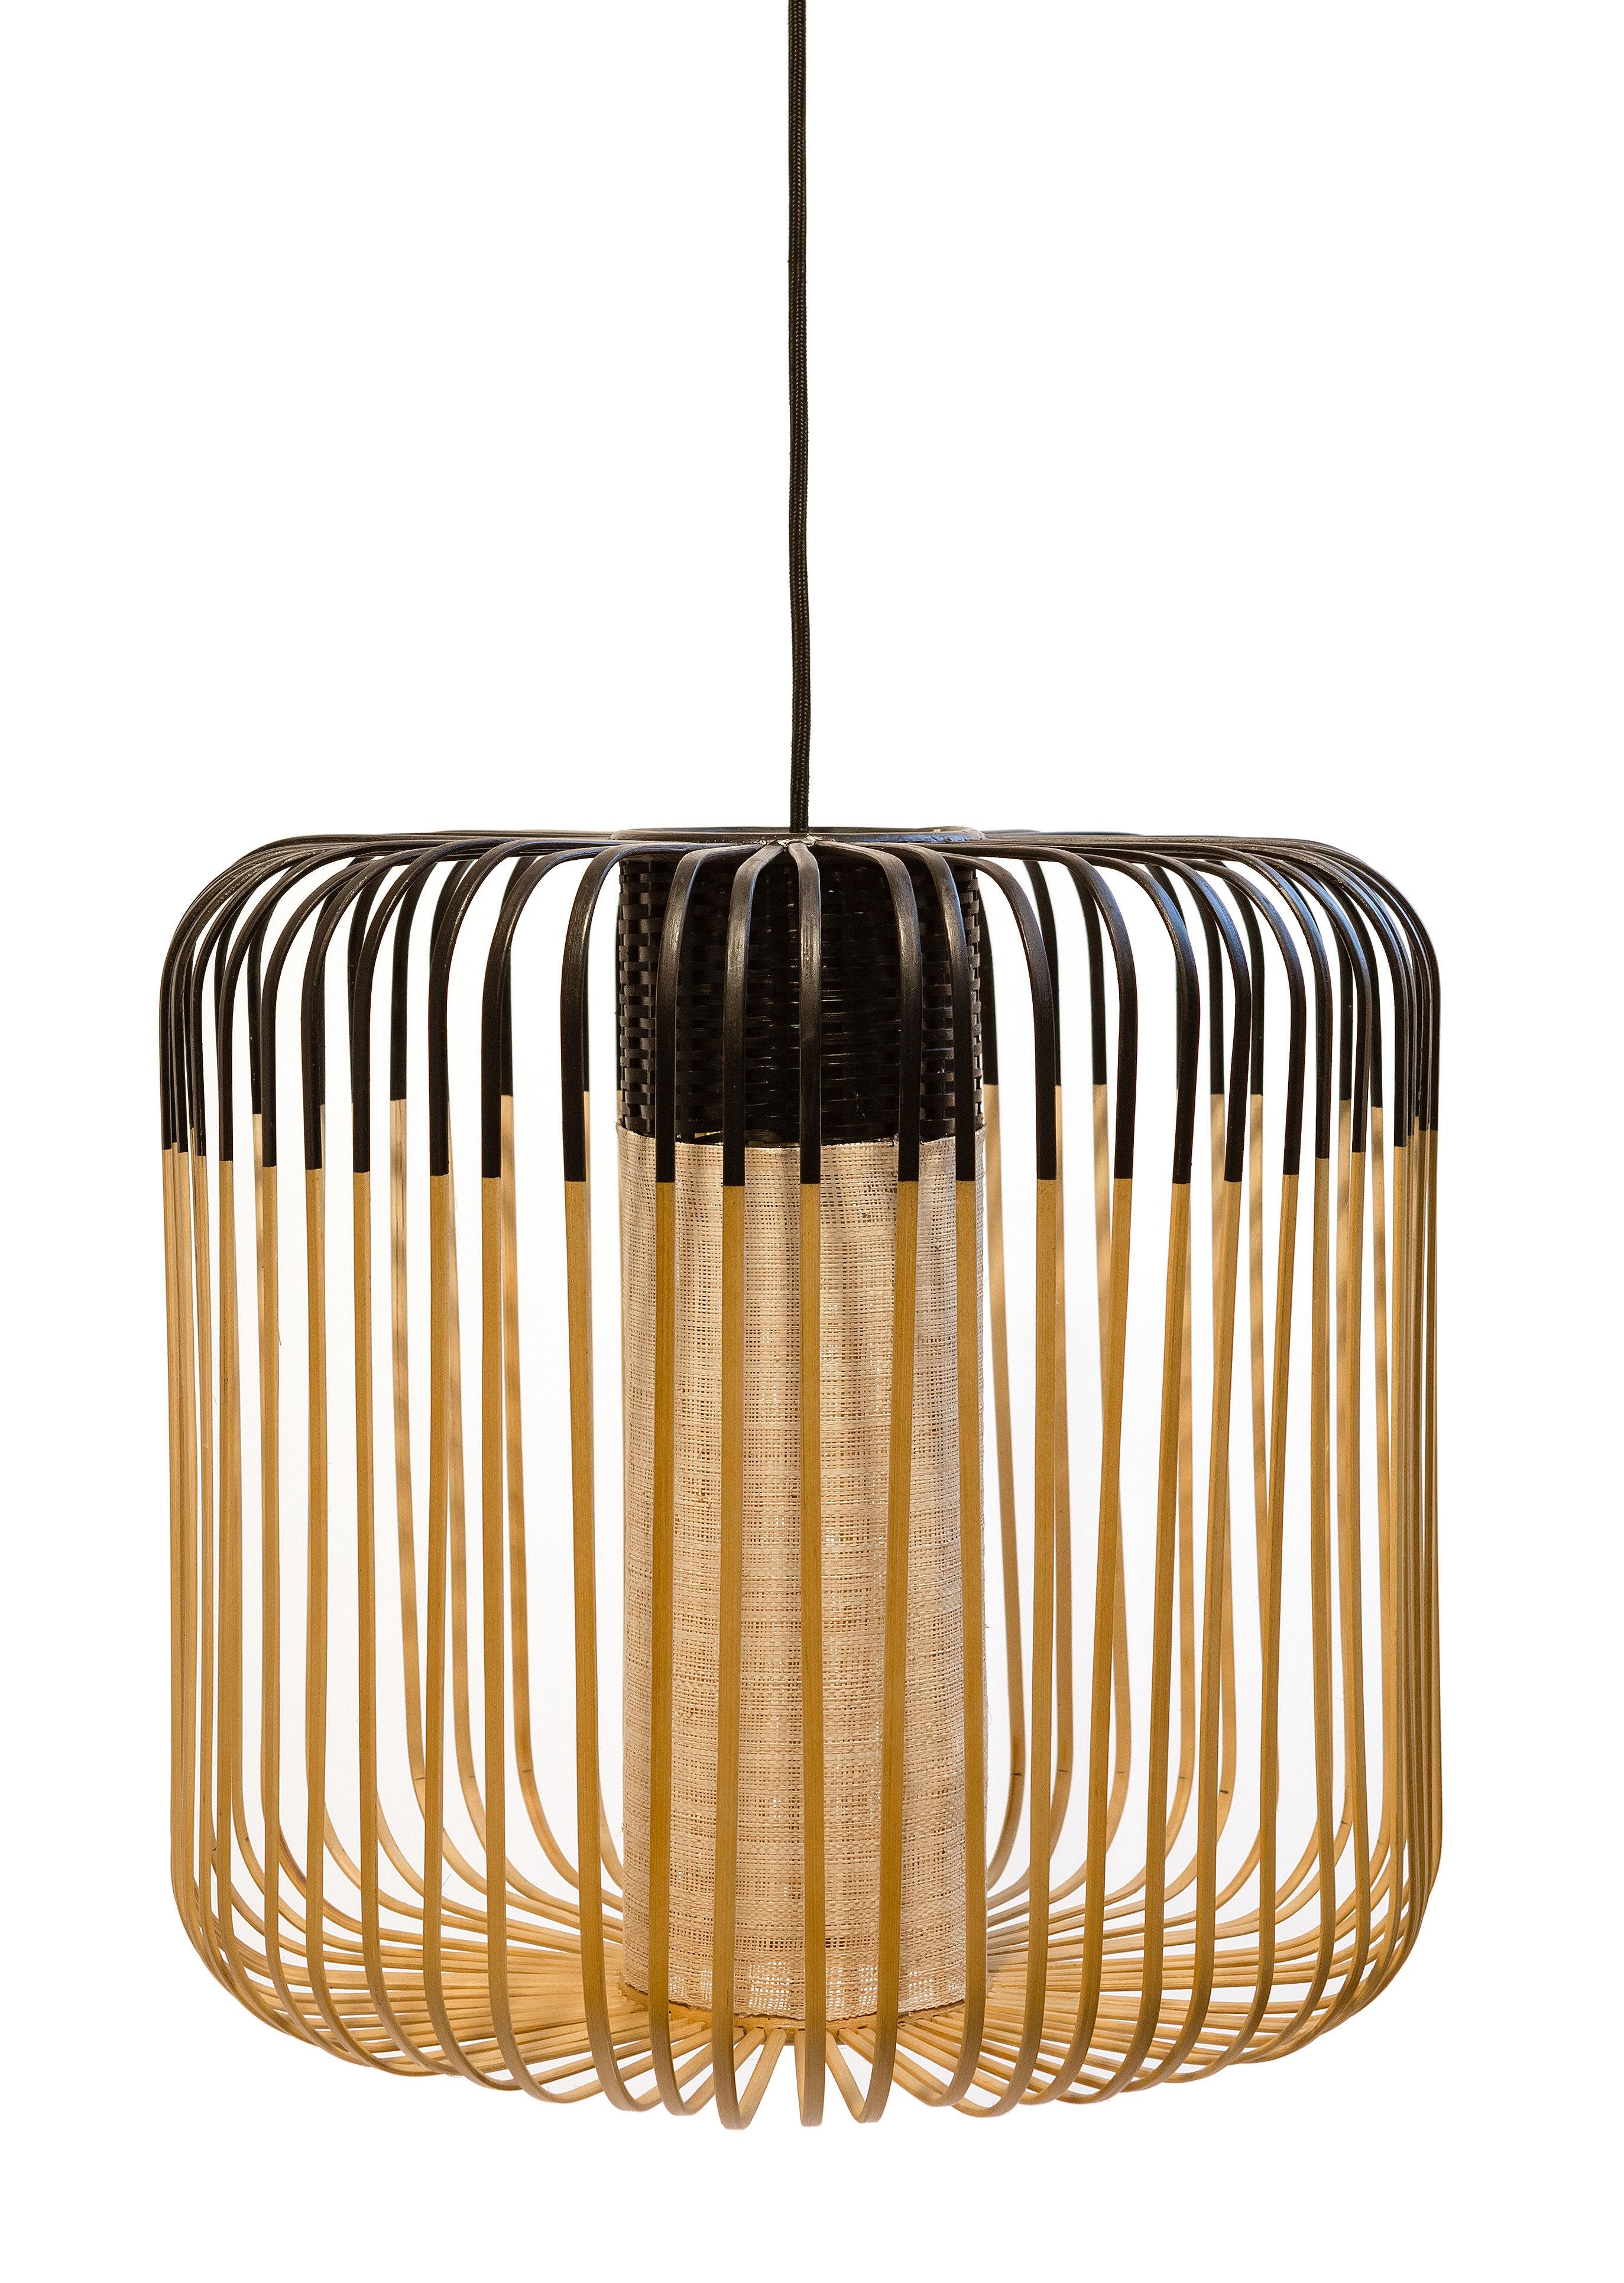 Luminaire - Suspensions - Suspension Bamboo Light M / H 40 x Ø 45 cm - Forestier - Noir / Naturel - Bambou naturel, Métal, Tissu